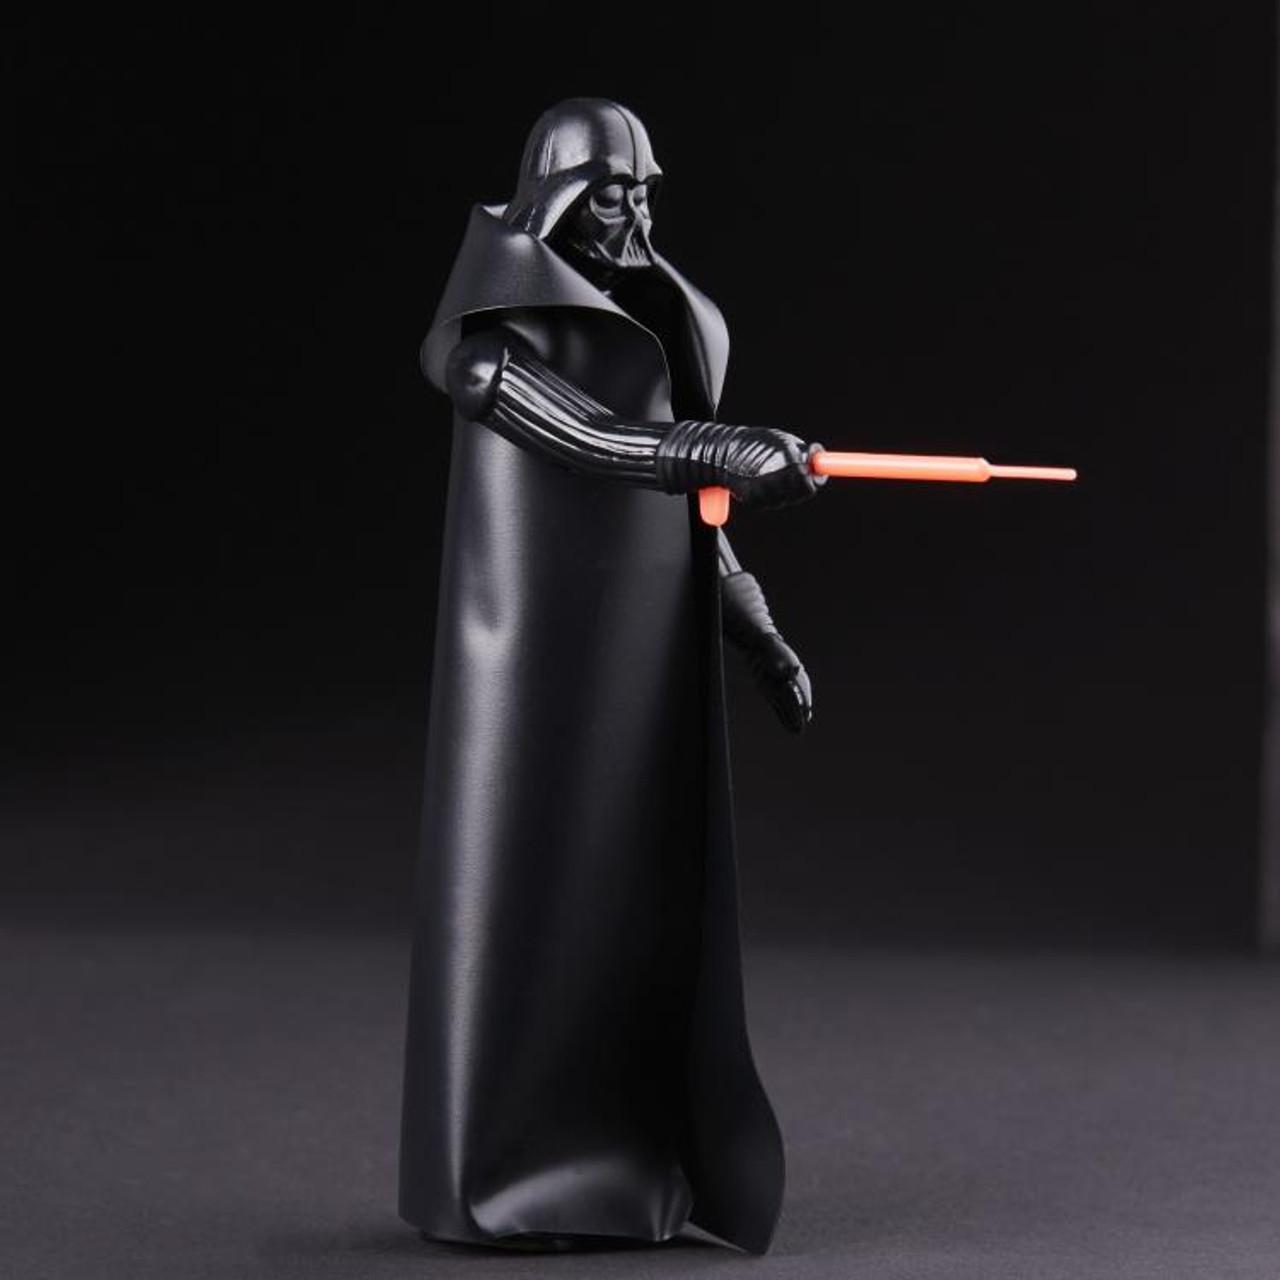 Star Wars - Retro Collection - Darth Vader Action Figure